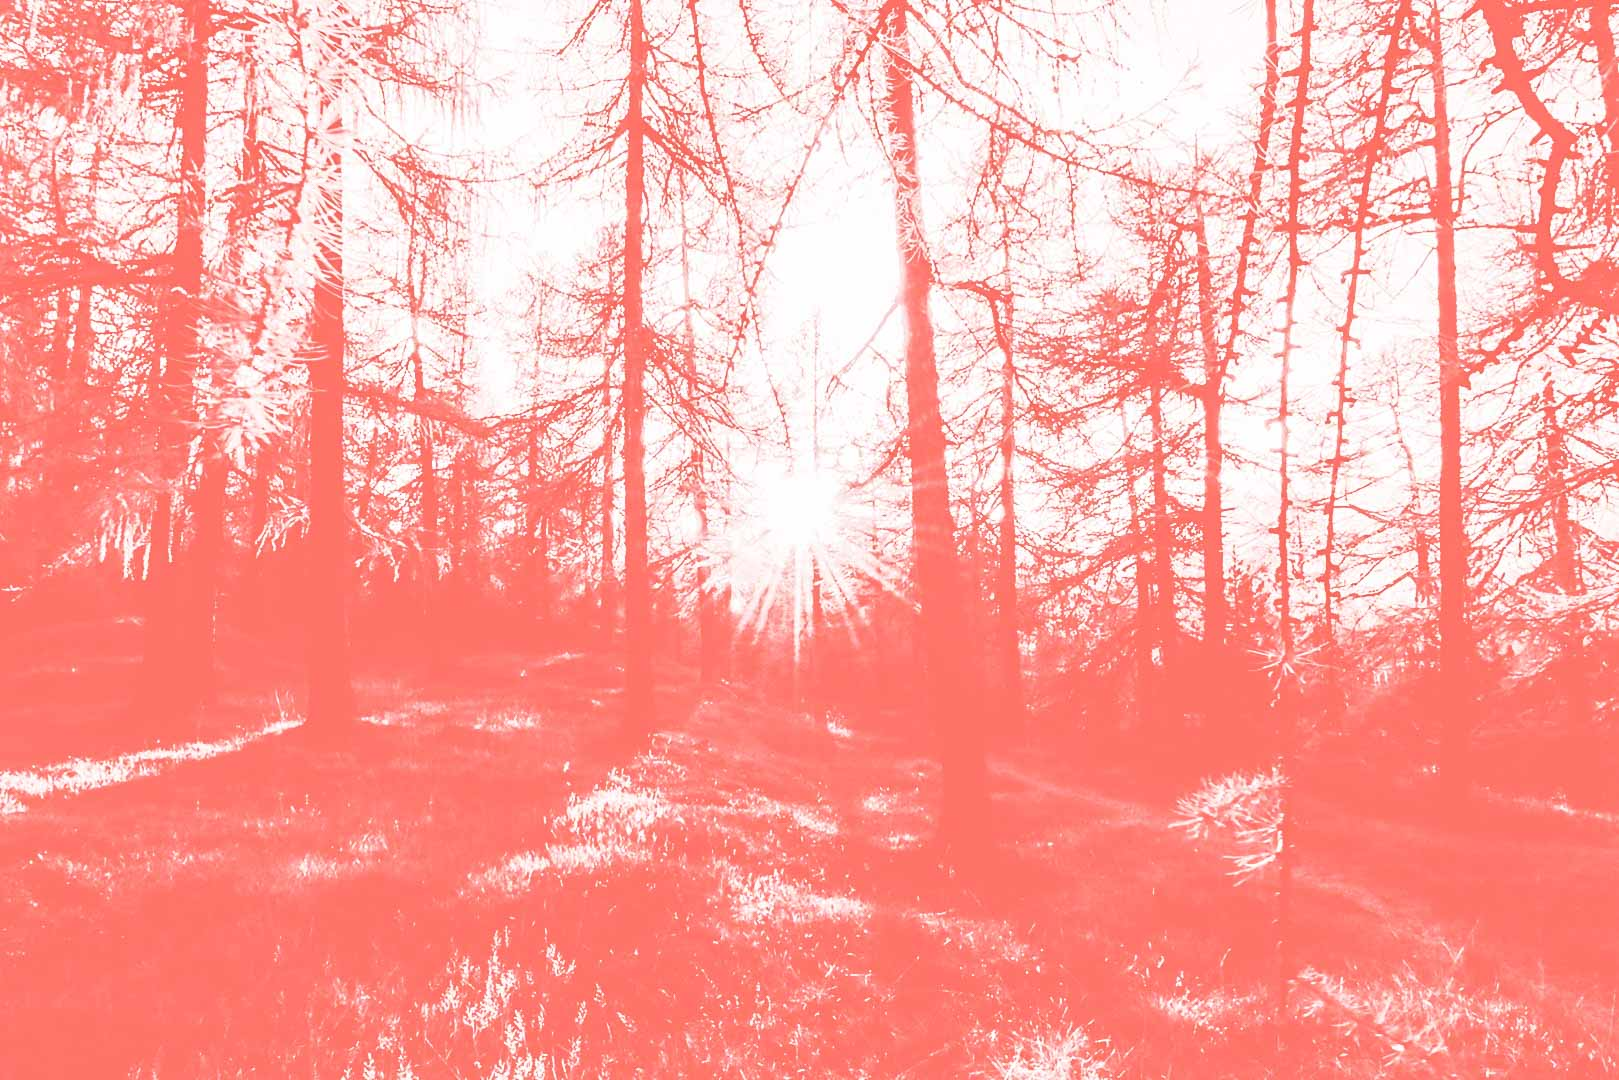 17122018-4Pantone16-1546-Foresta.jpg